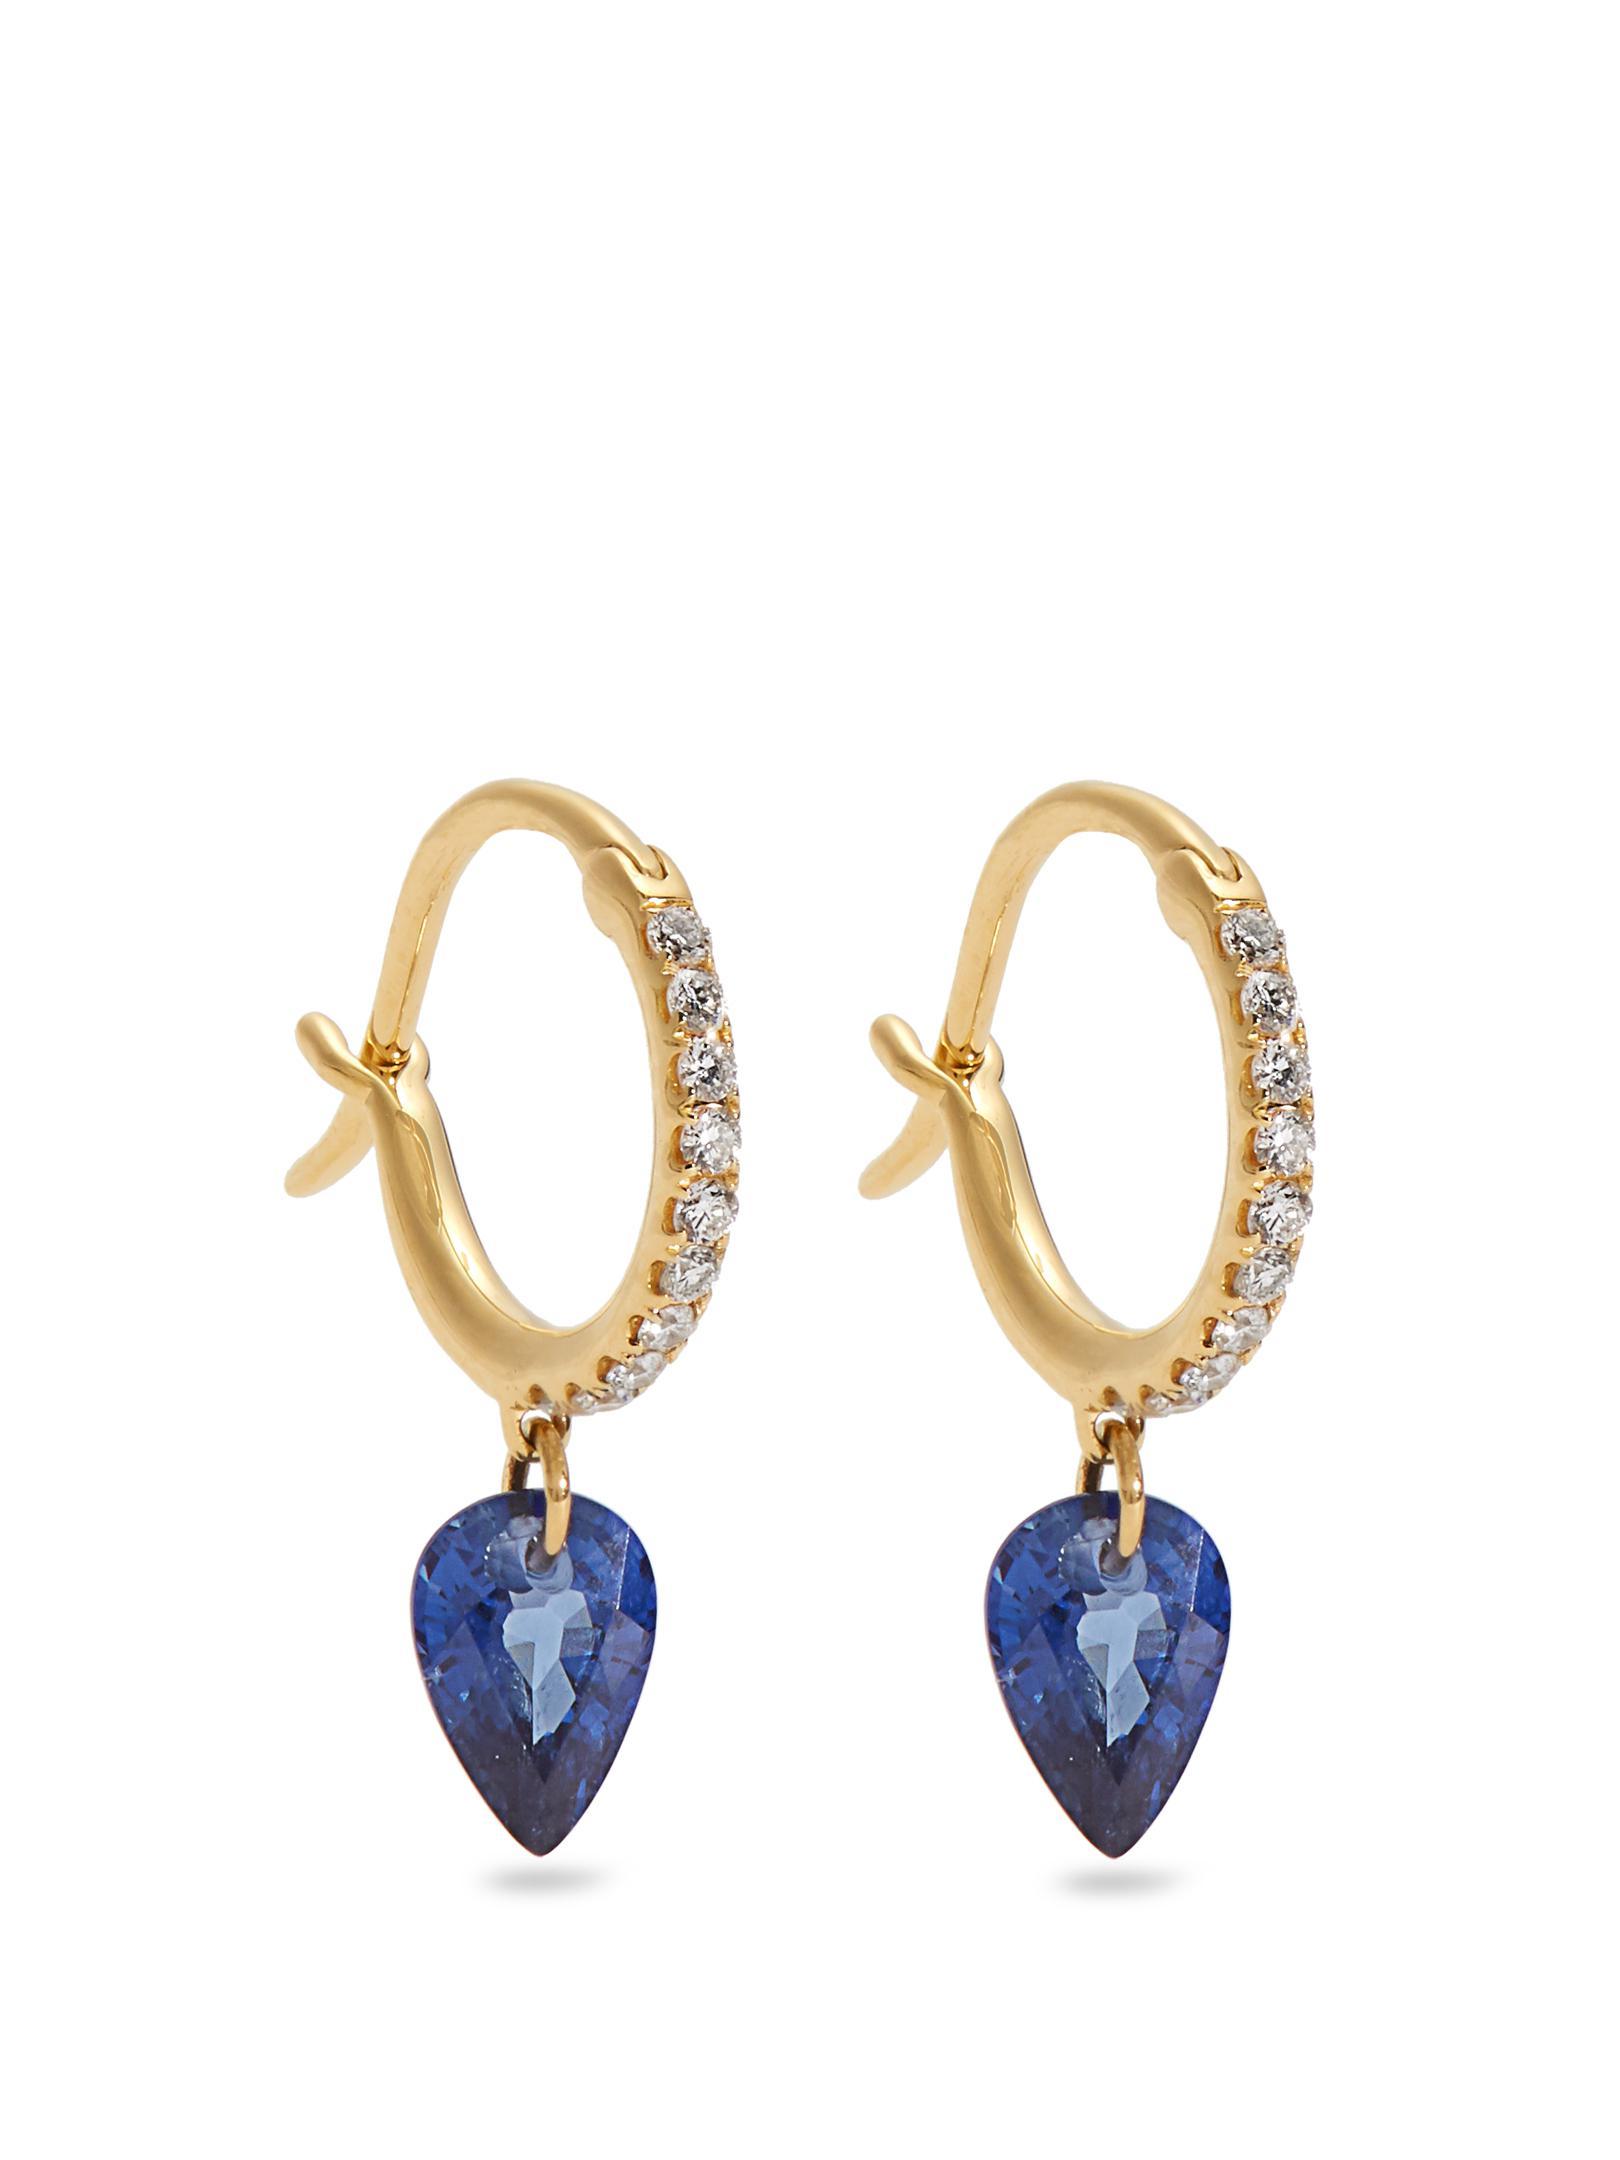 Raphaele Canot Set Free diamond & pink-gold earrings MJdTr